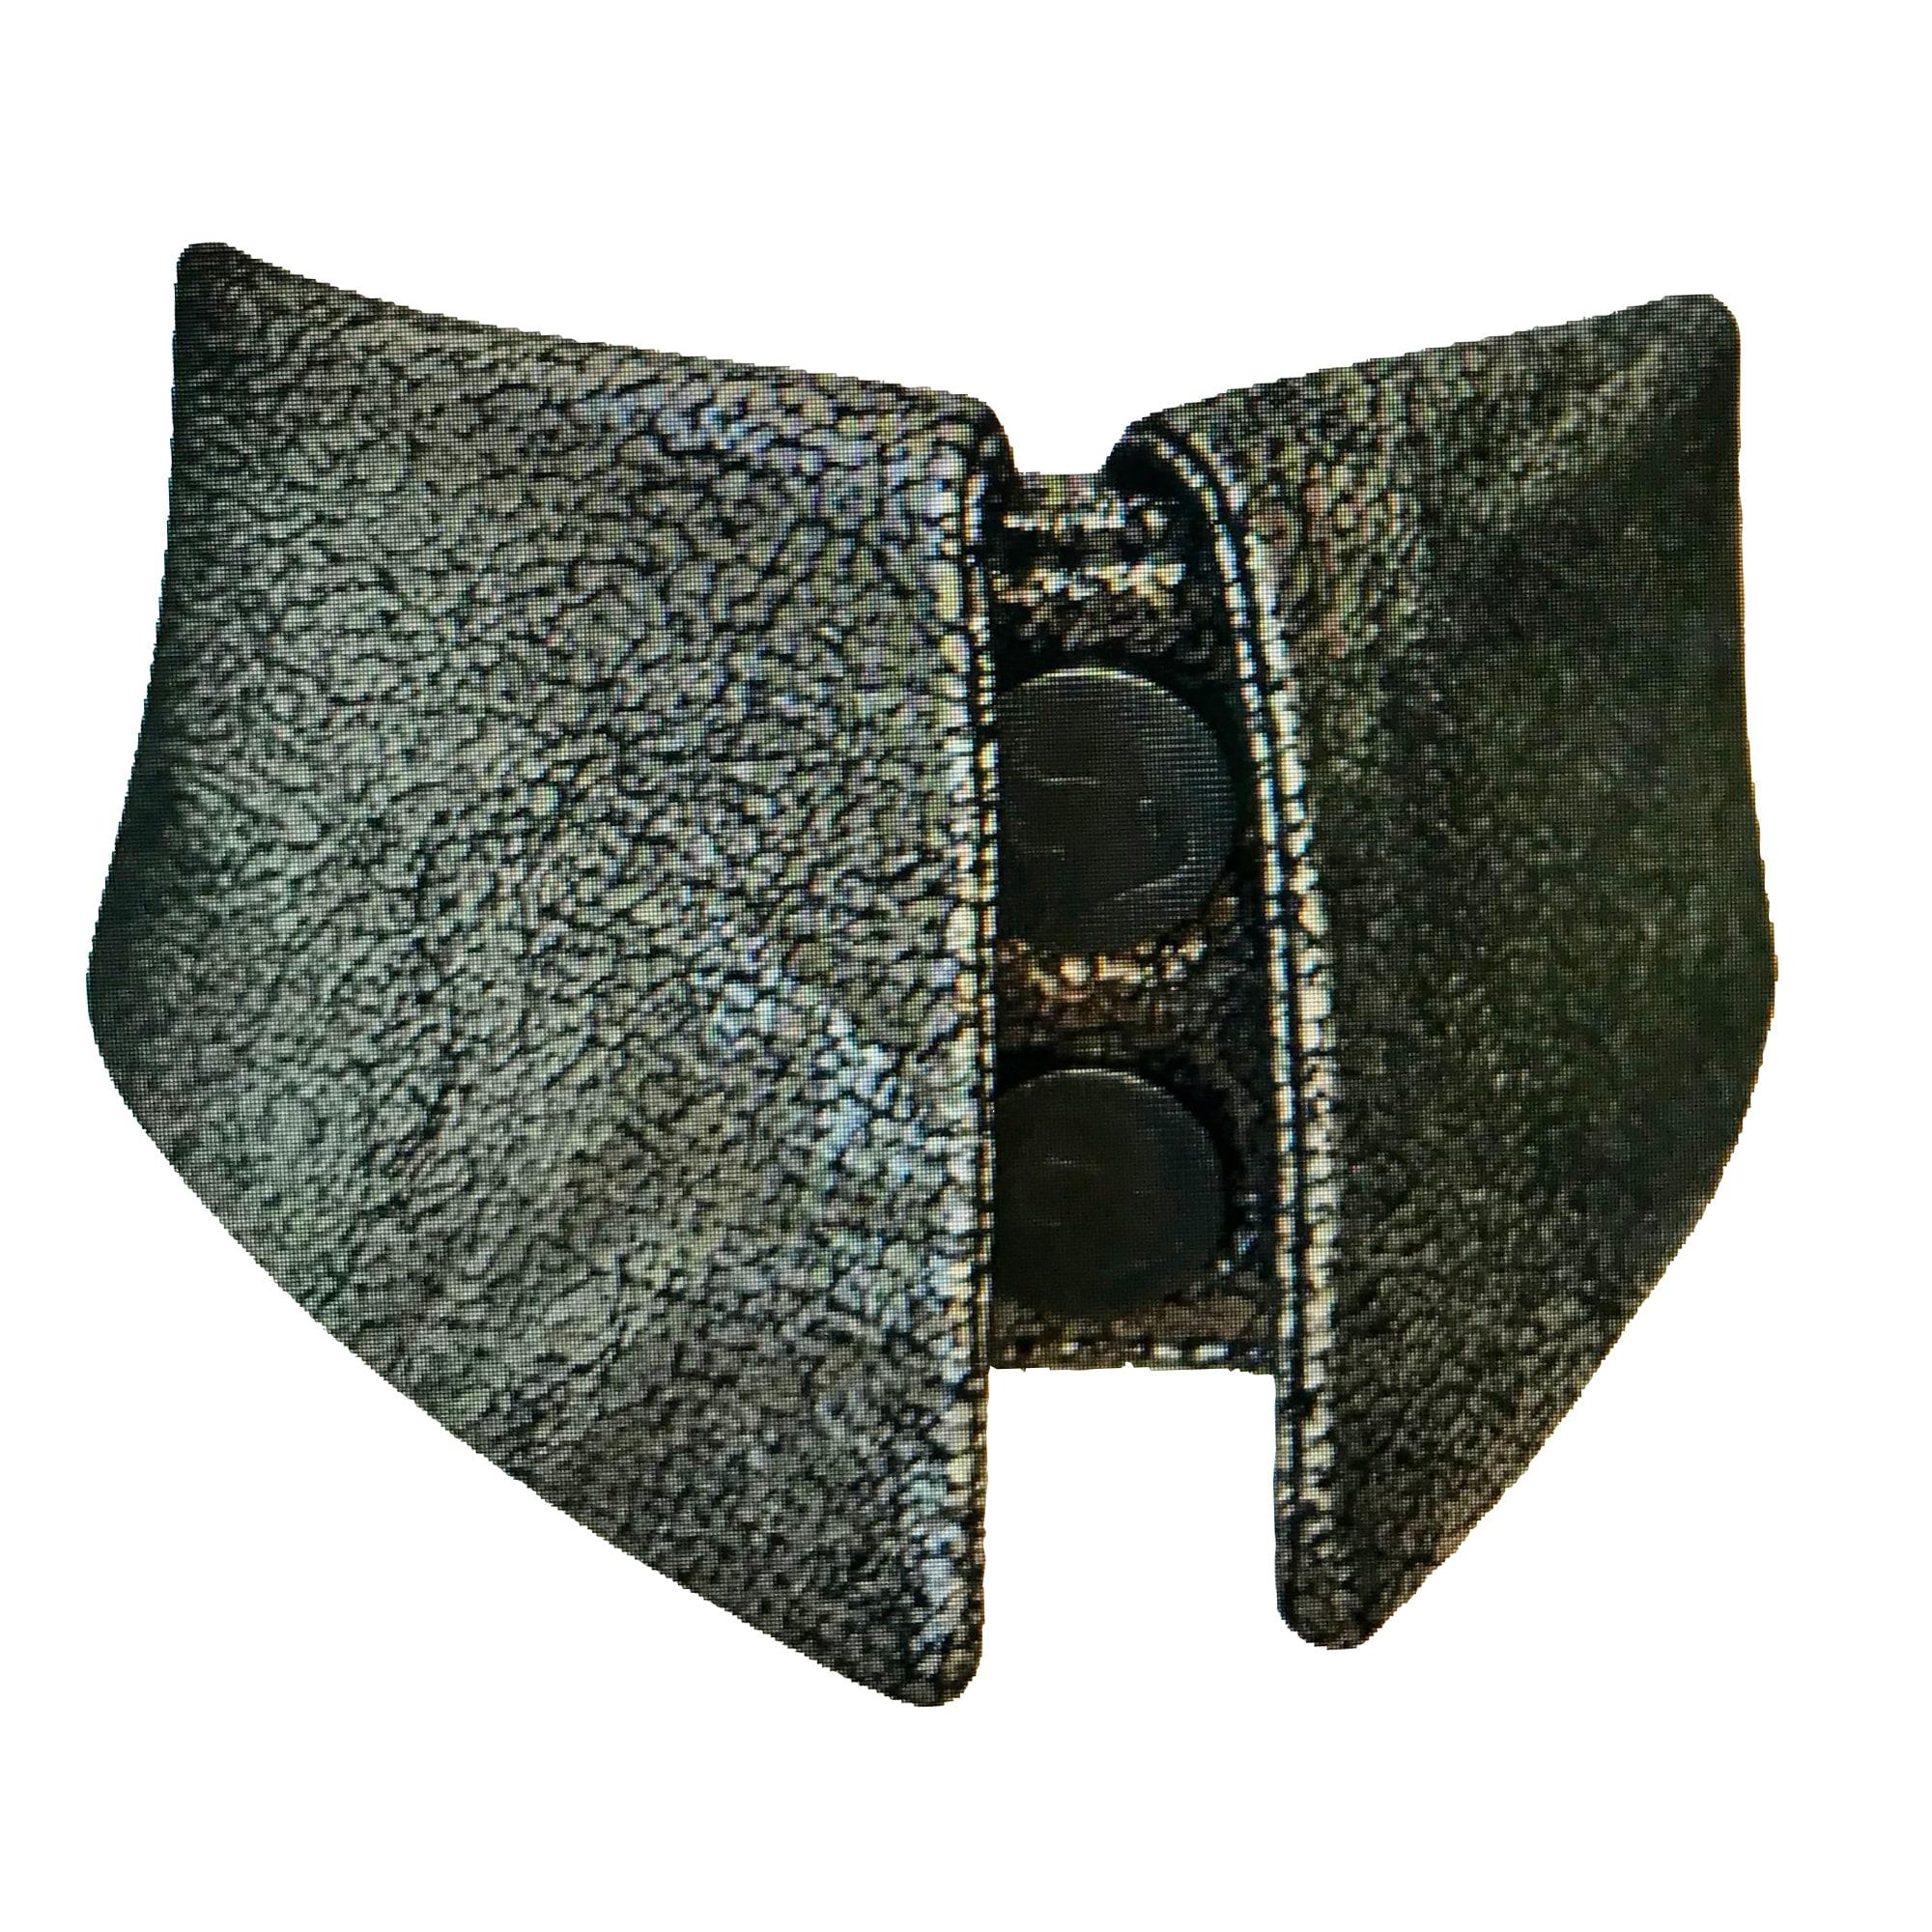 Krawatte KARL LAGERFELD Gold, Bronze, Kupfer